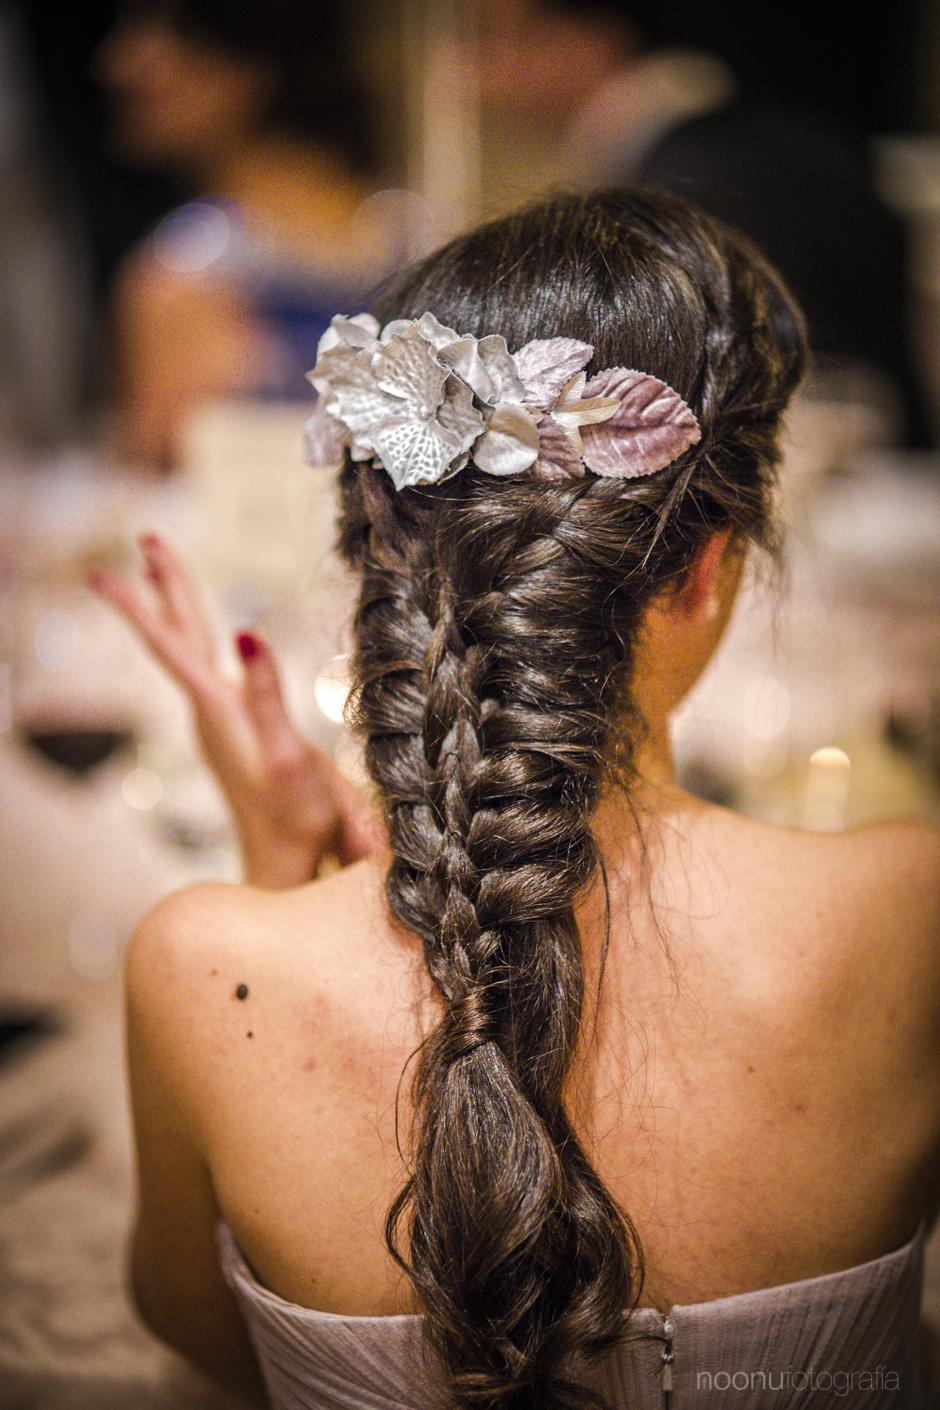 Noonu-fotografo-de-bodas-madrid-bea 44